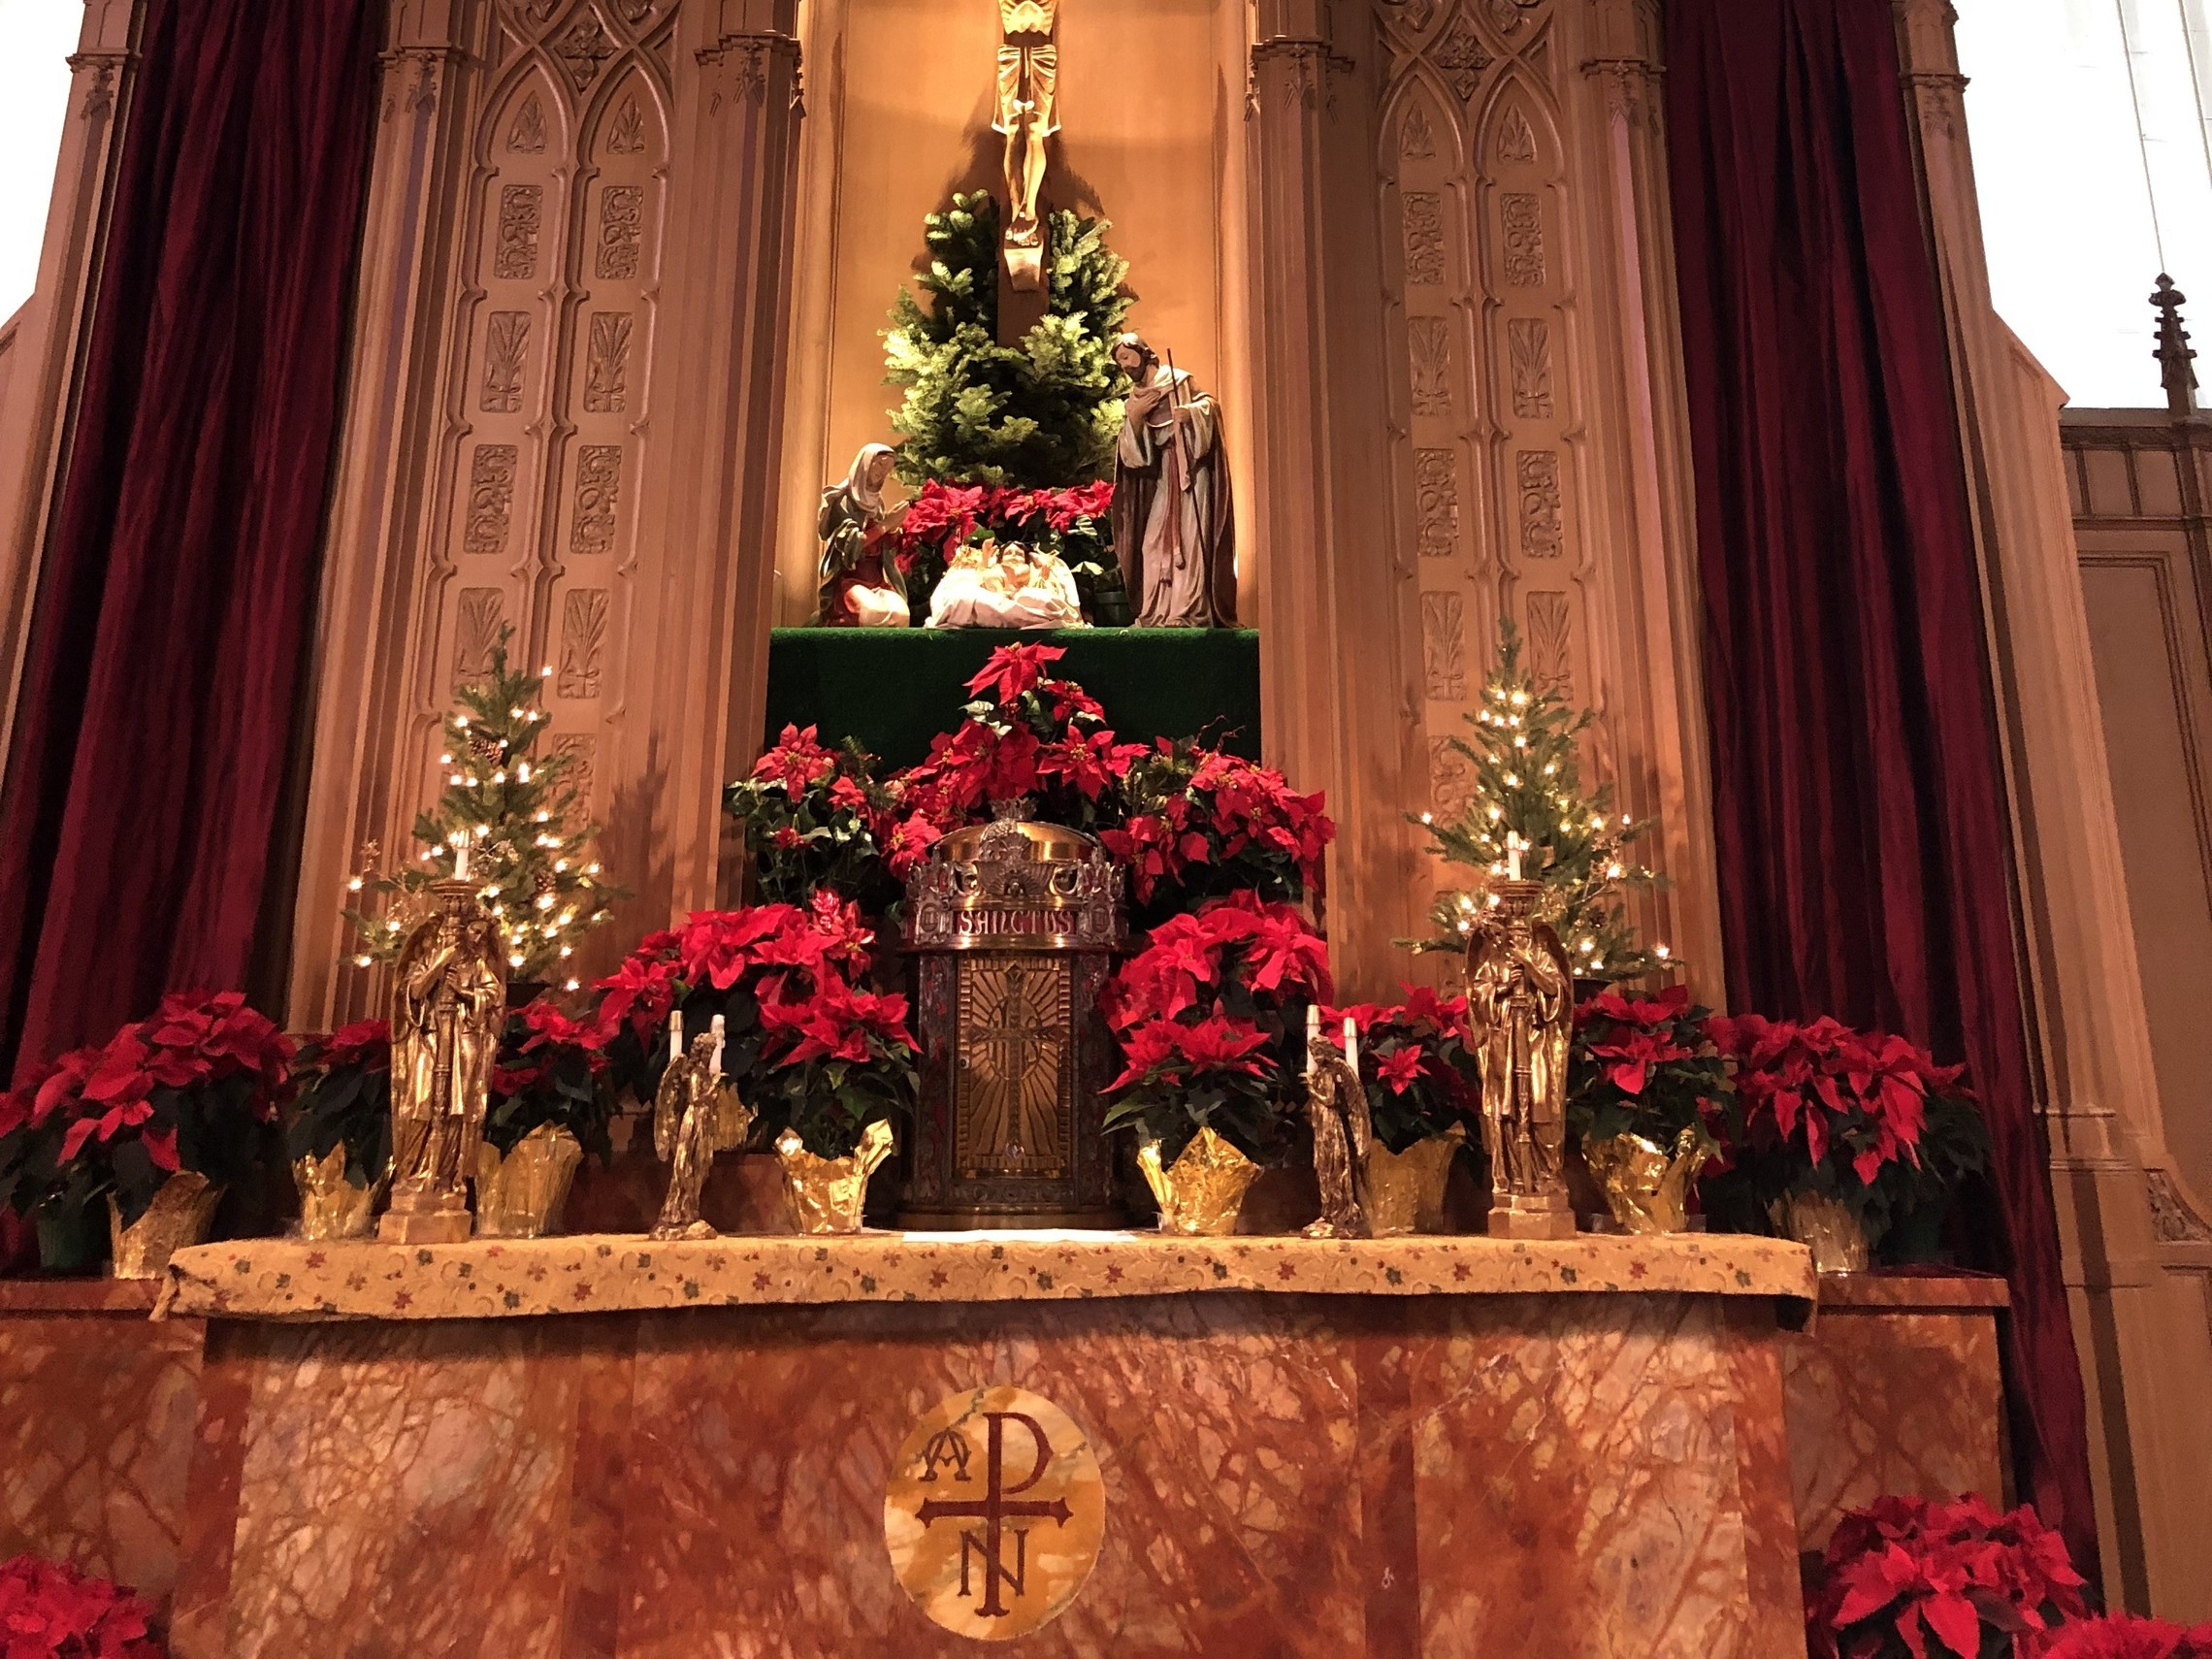 Altar. Christmas